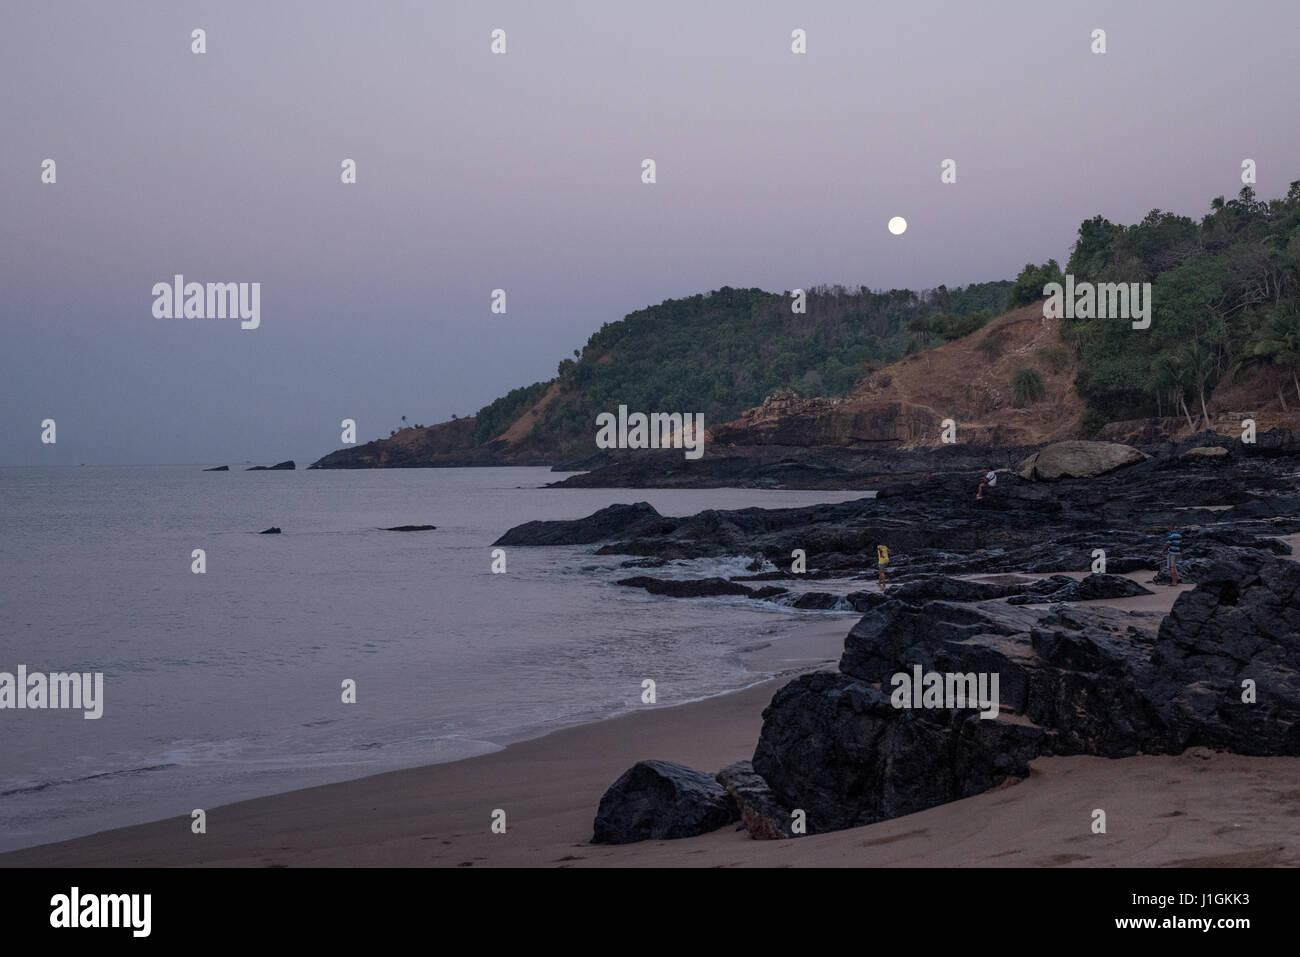 Moonset at paradise beach - Stock Image